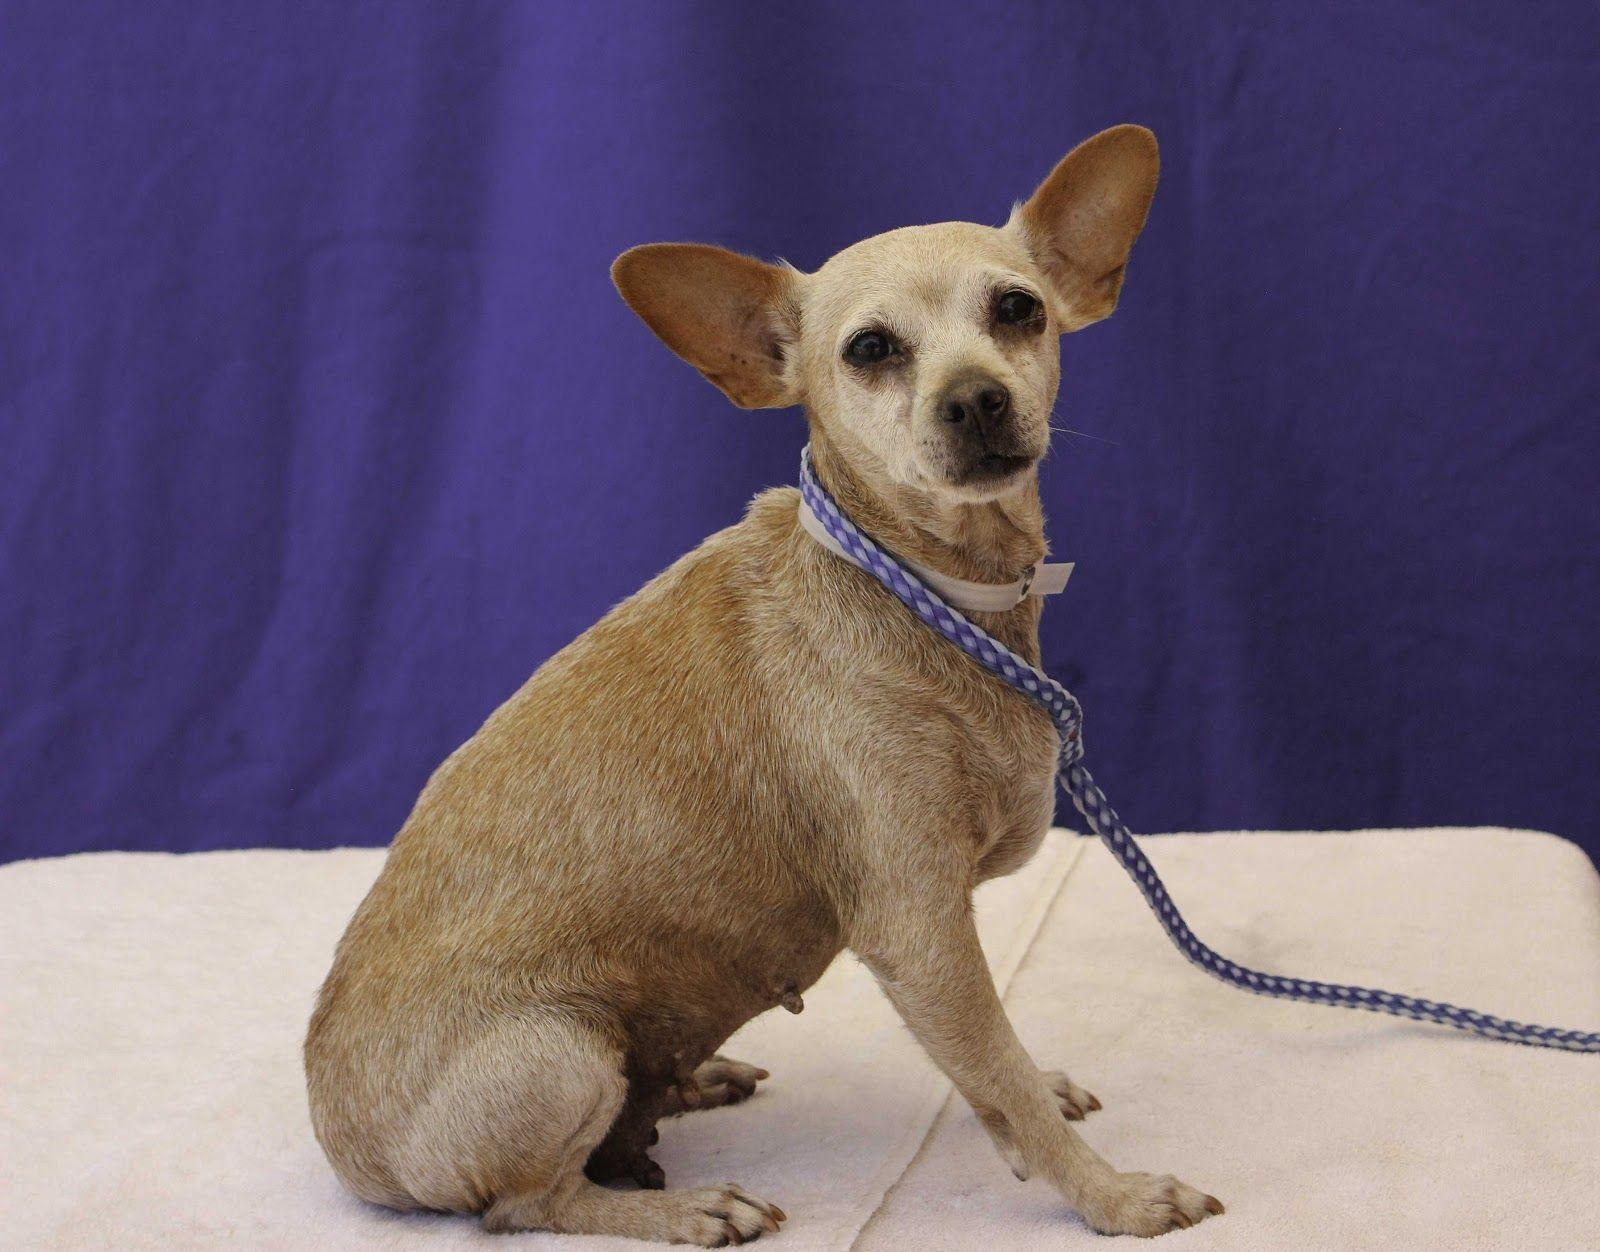 Chihuahua dog for Adoption in Pasadena, CA. ADN605442 on